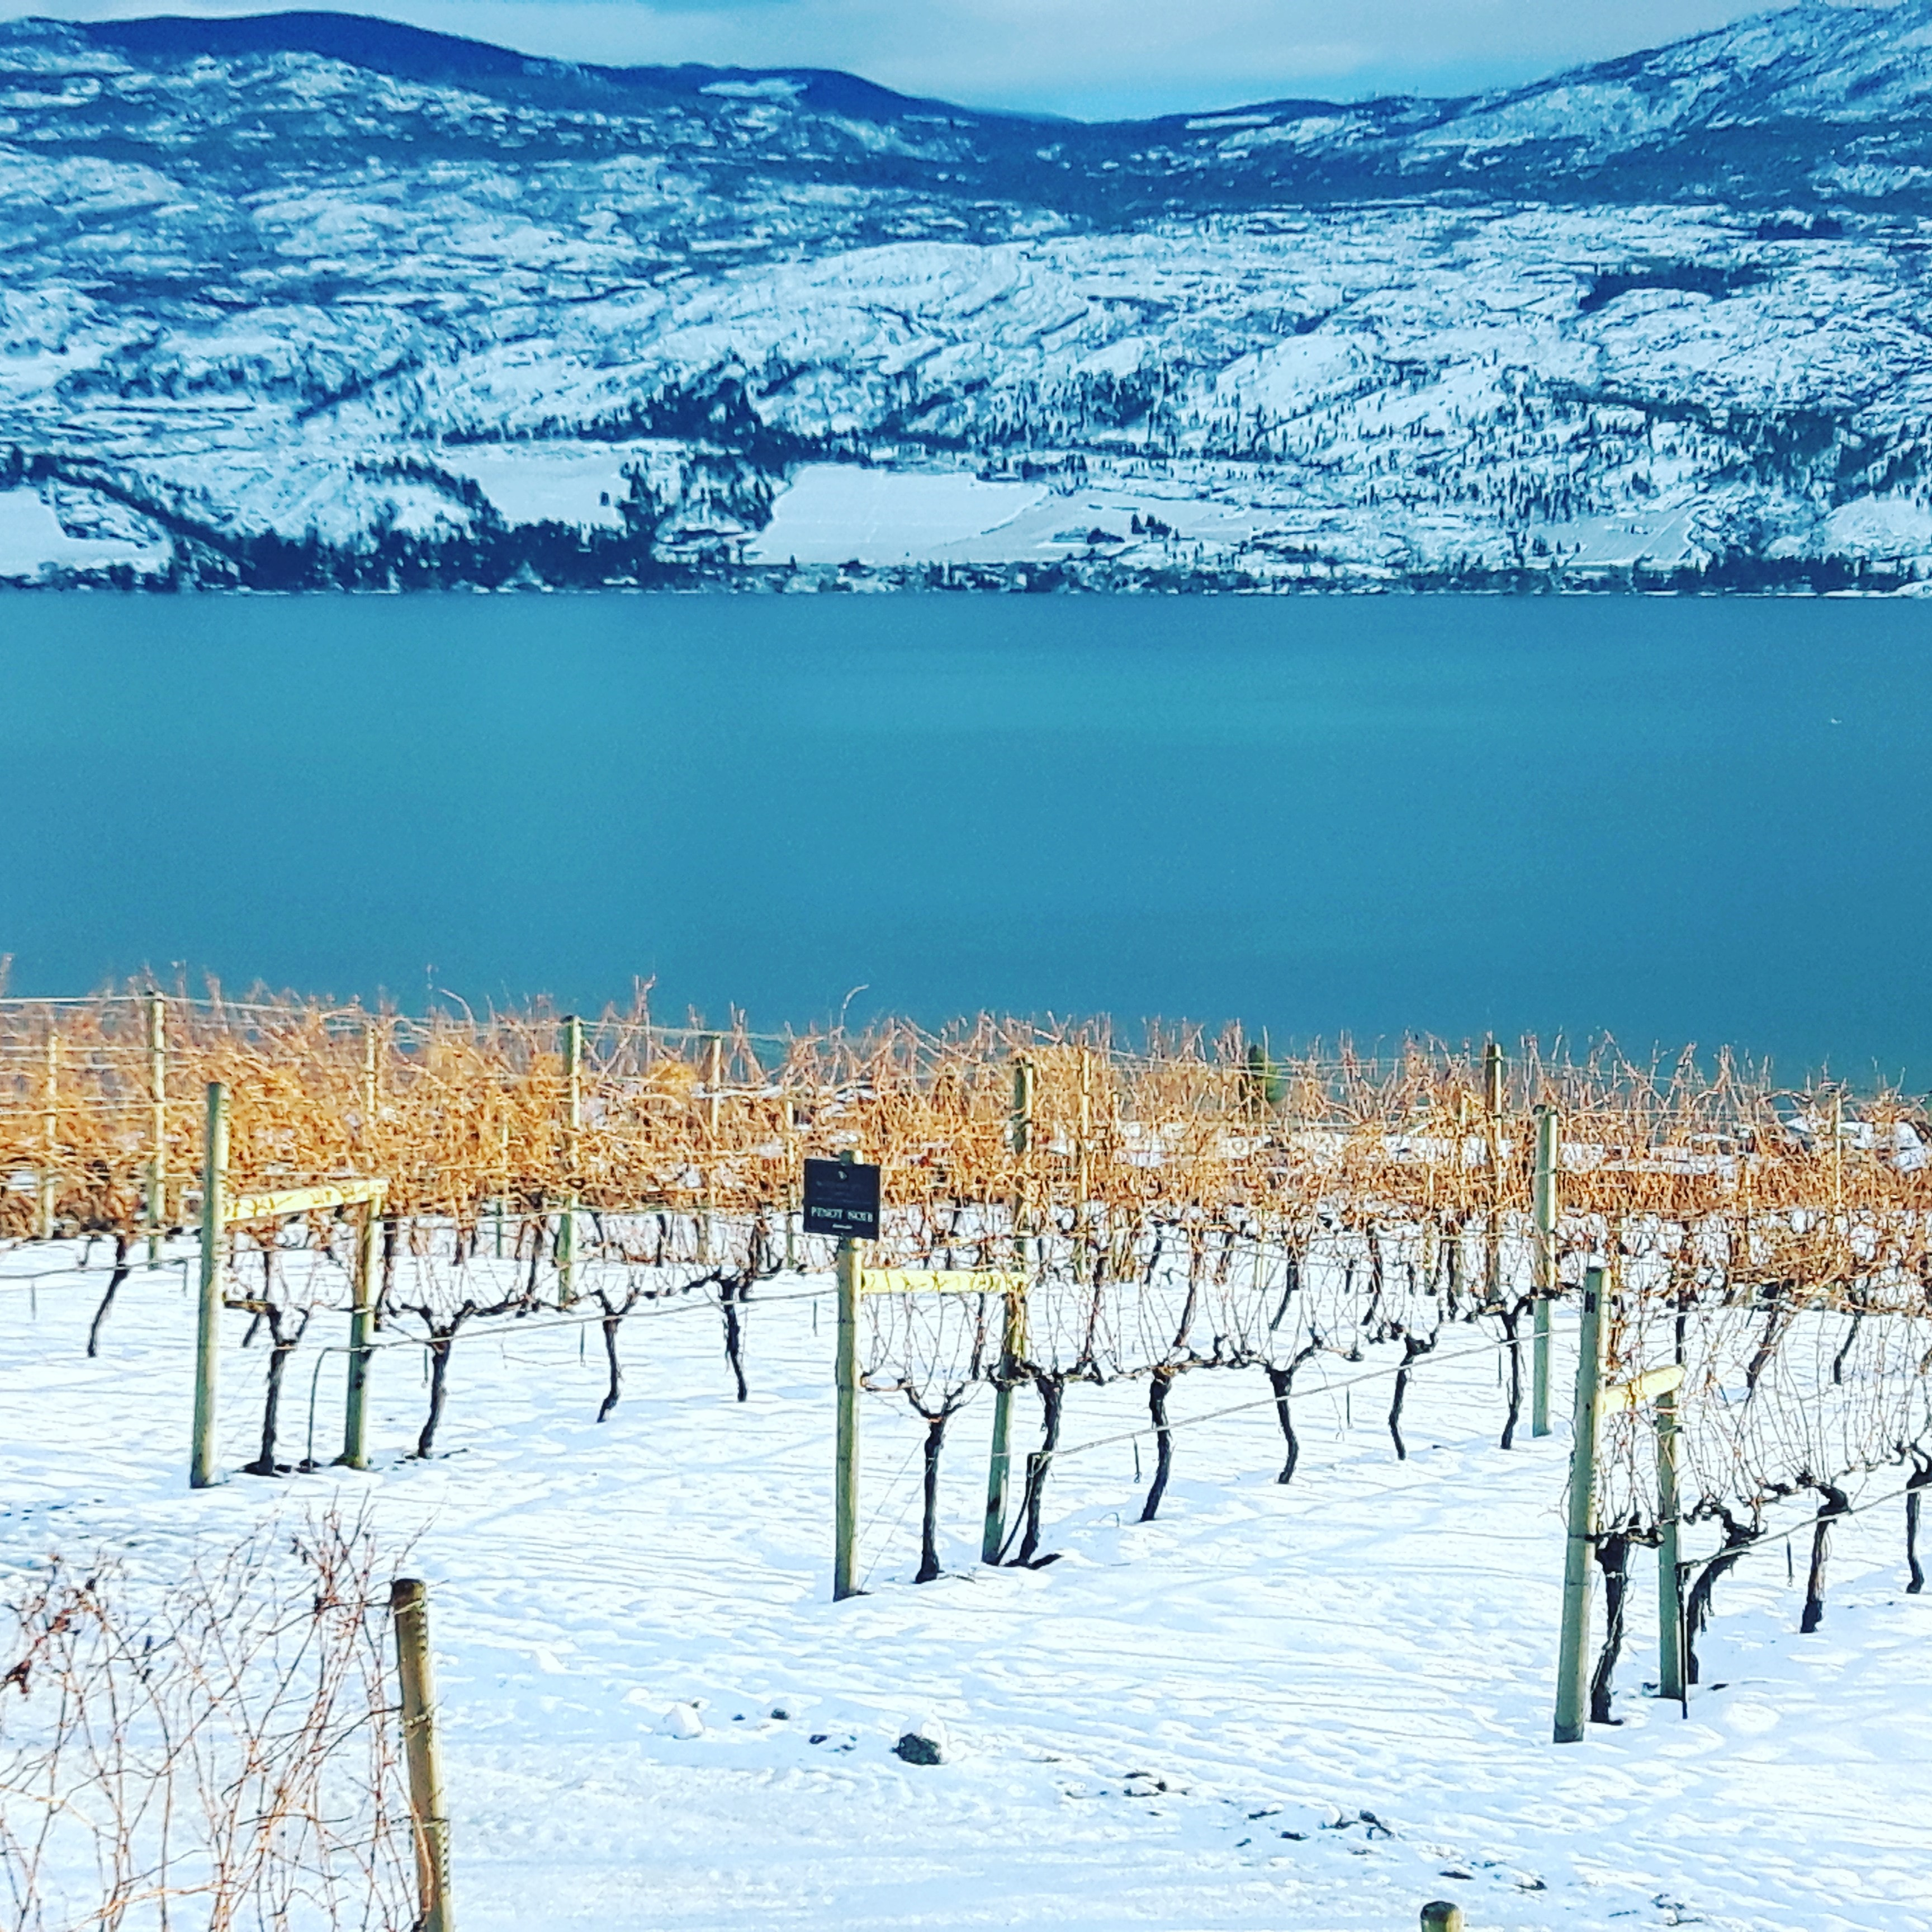 Vineyard in Okanagan Valley, Kelowna, British Columbia